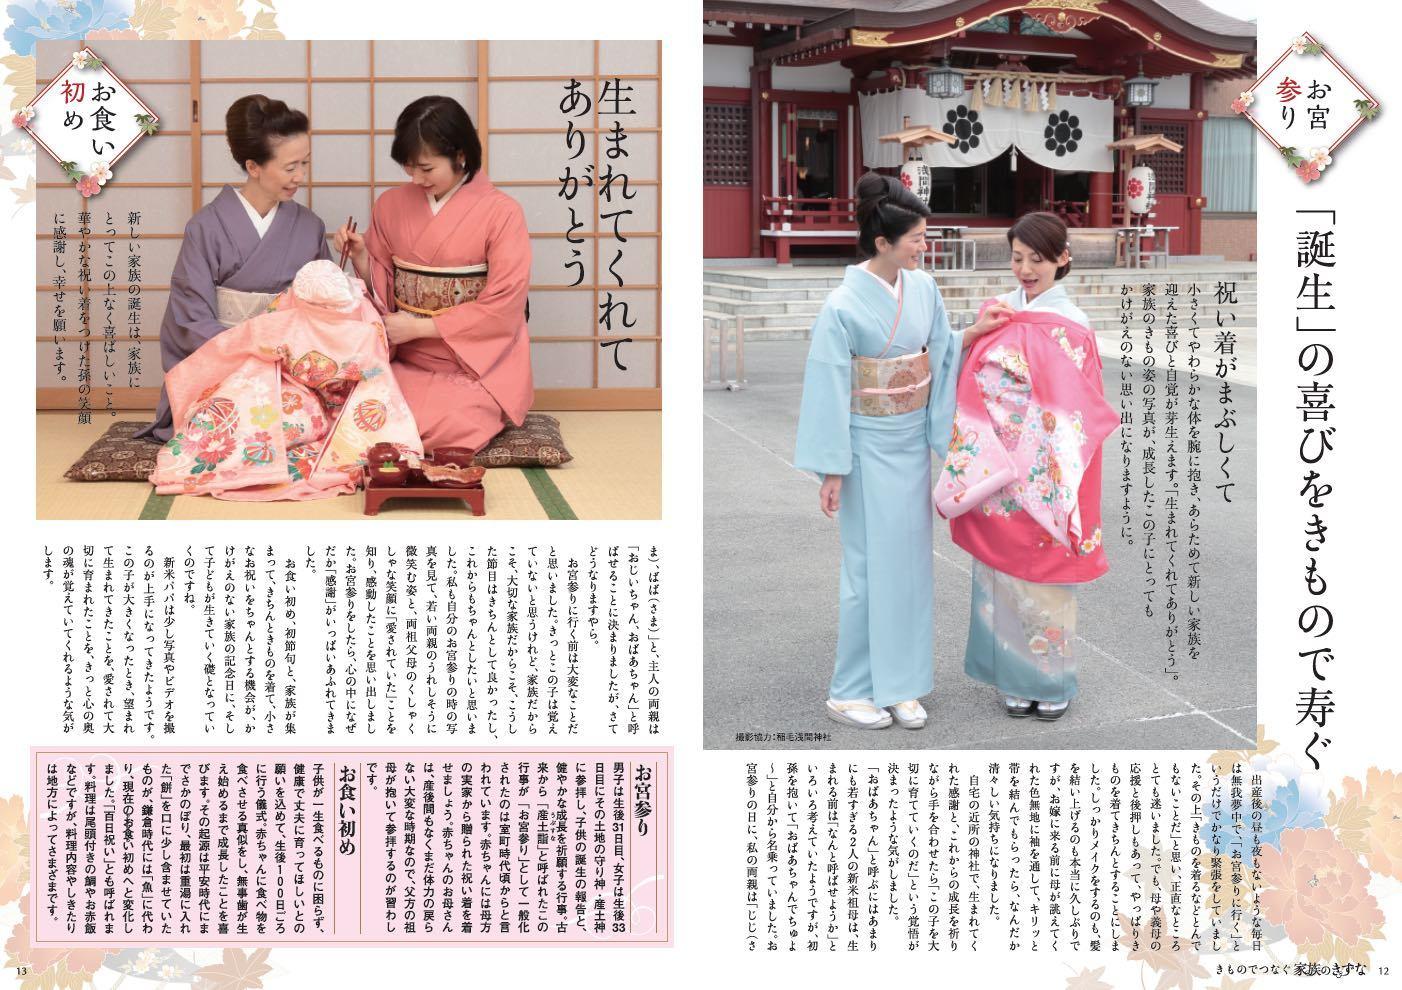 omairi_tukagirei.jpg